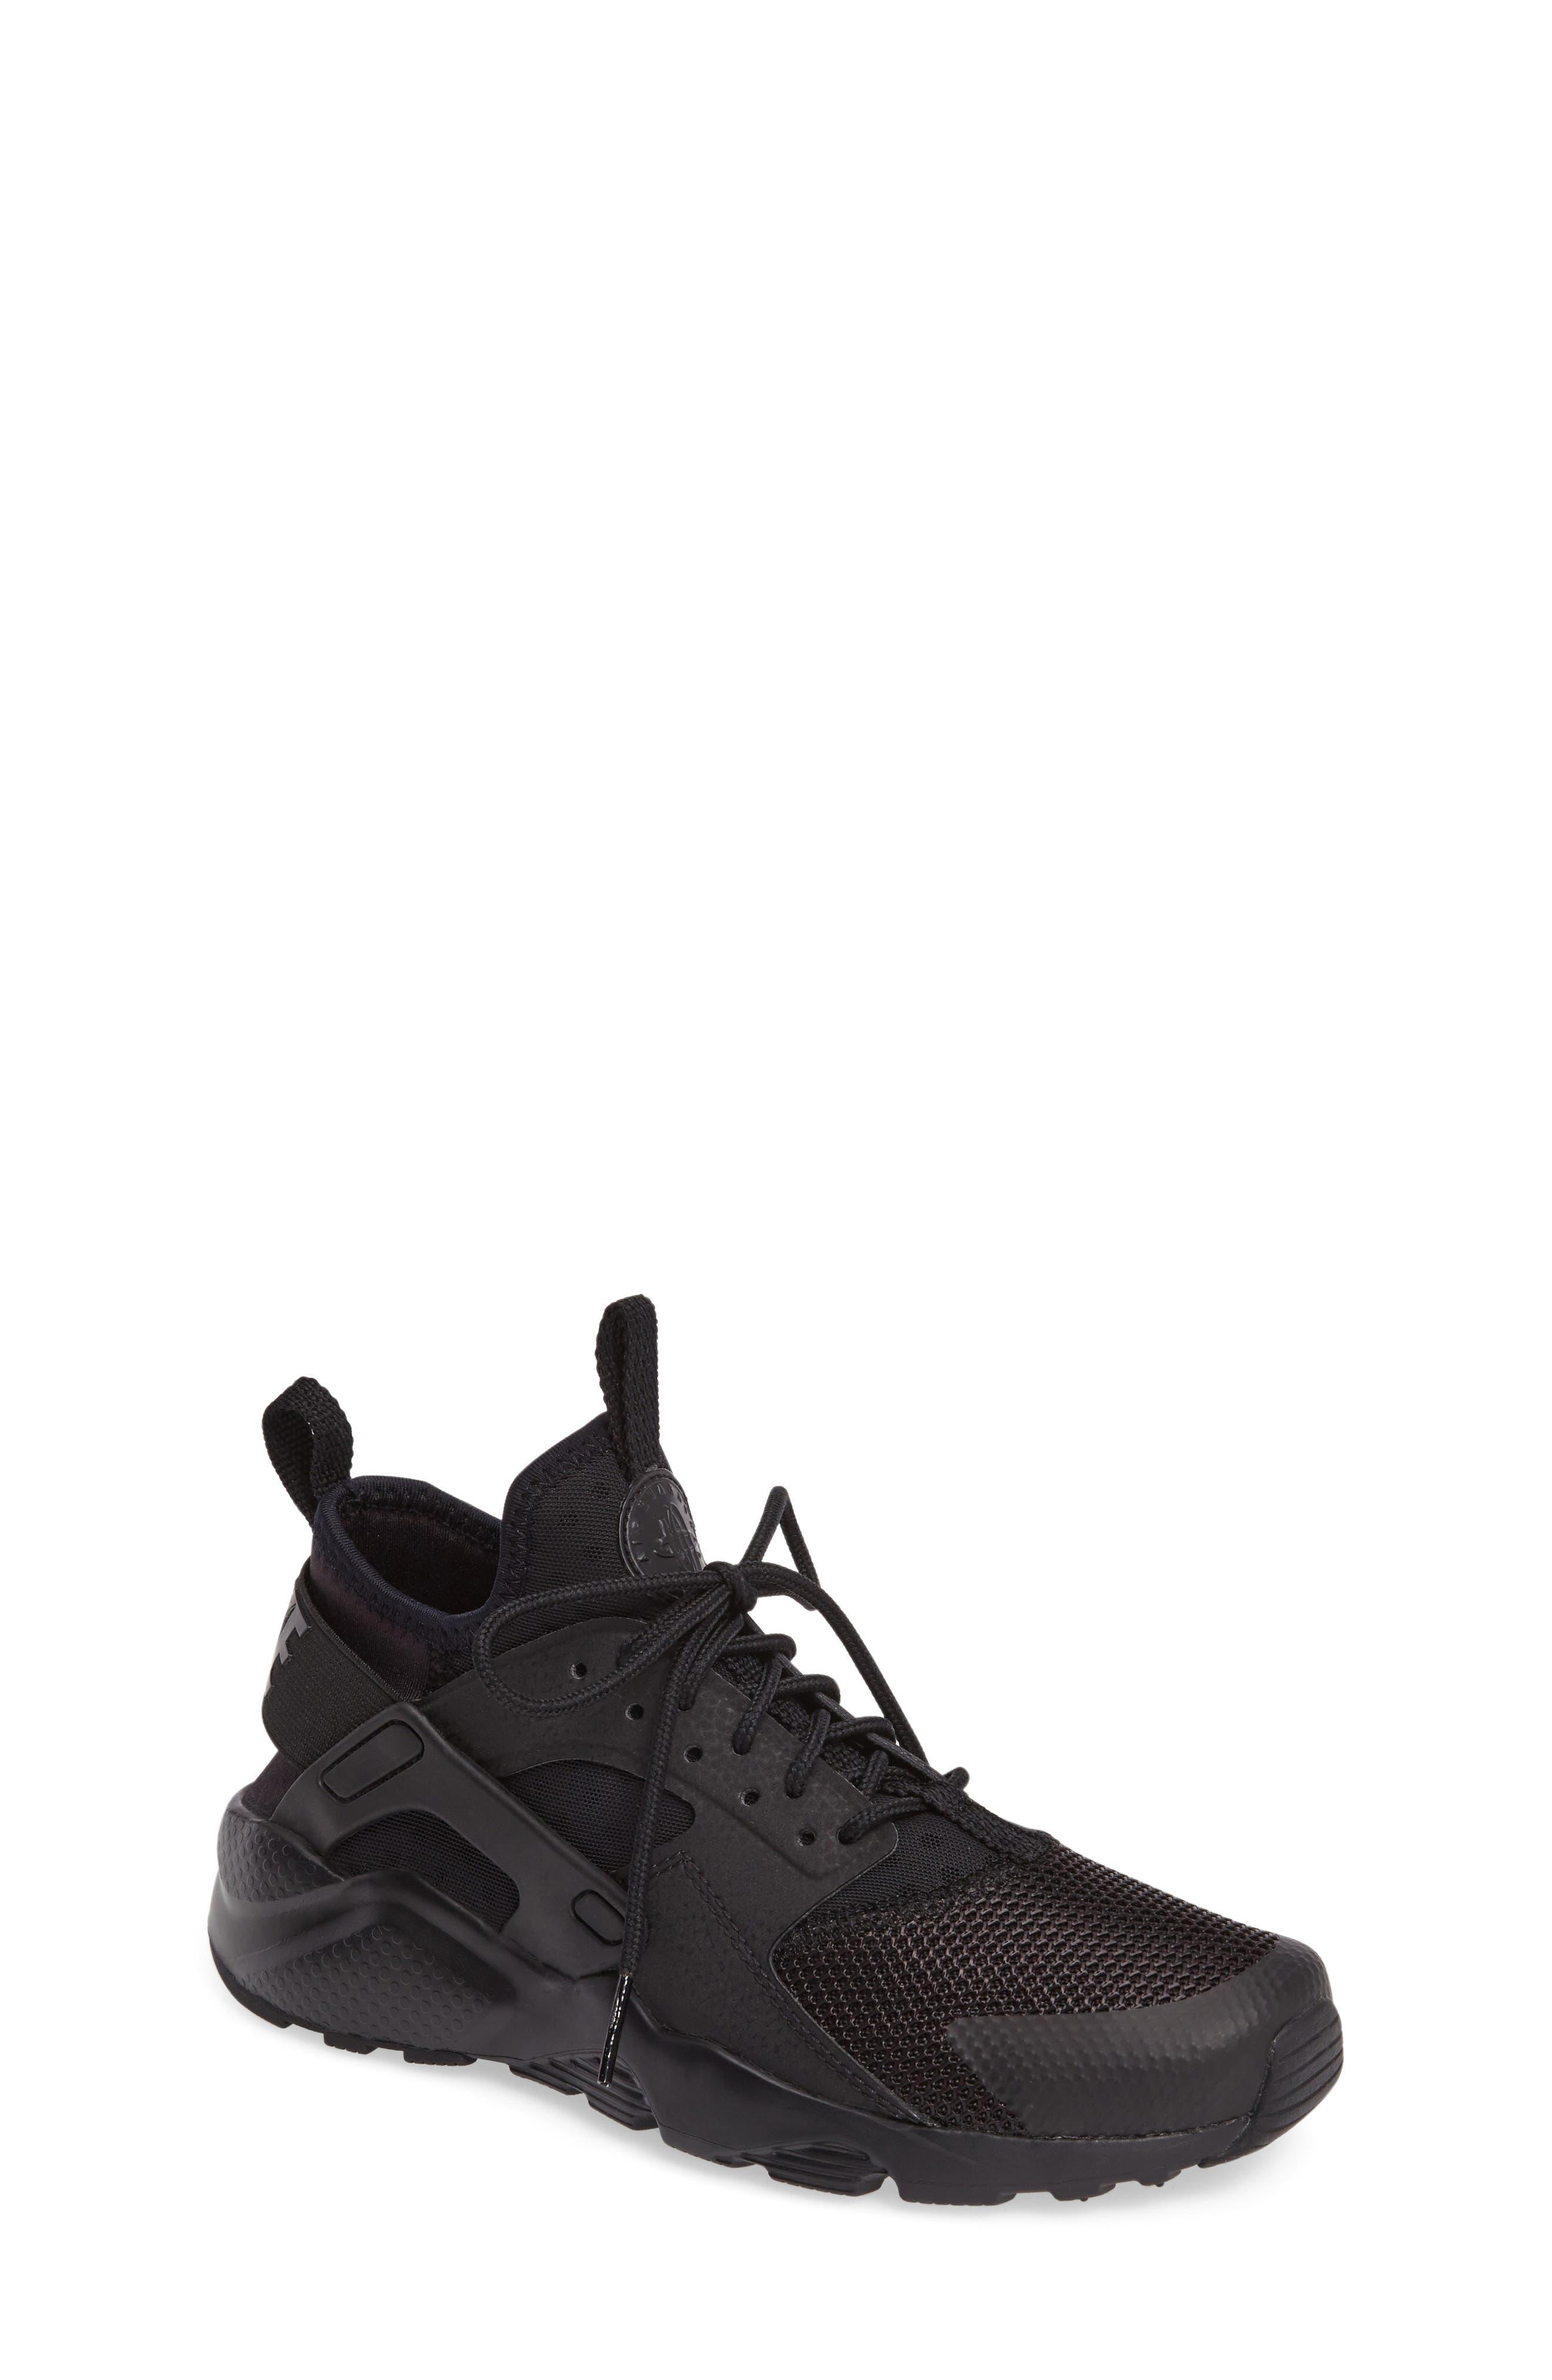 Alternate Image 1 Selected - Nike Air Huarache Run Ultra Sneaker (Big Kid)